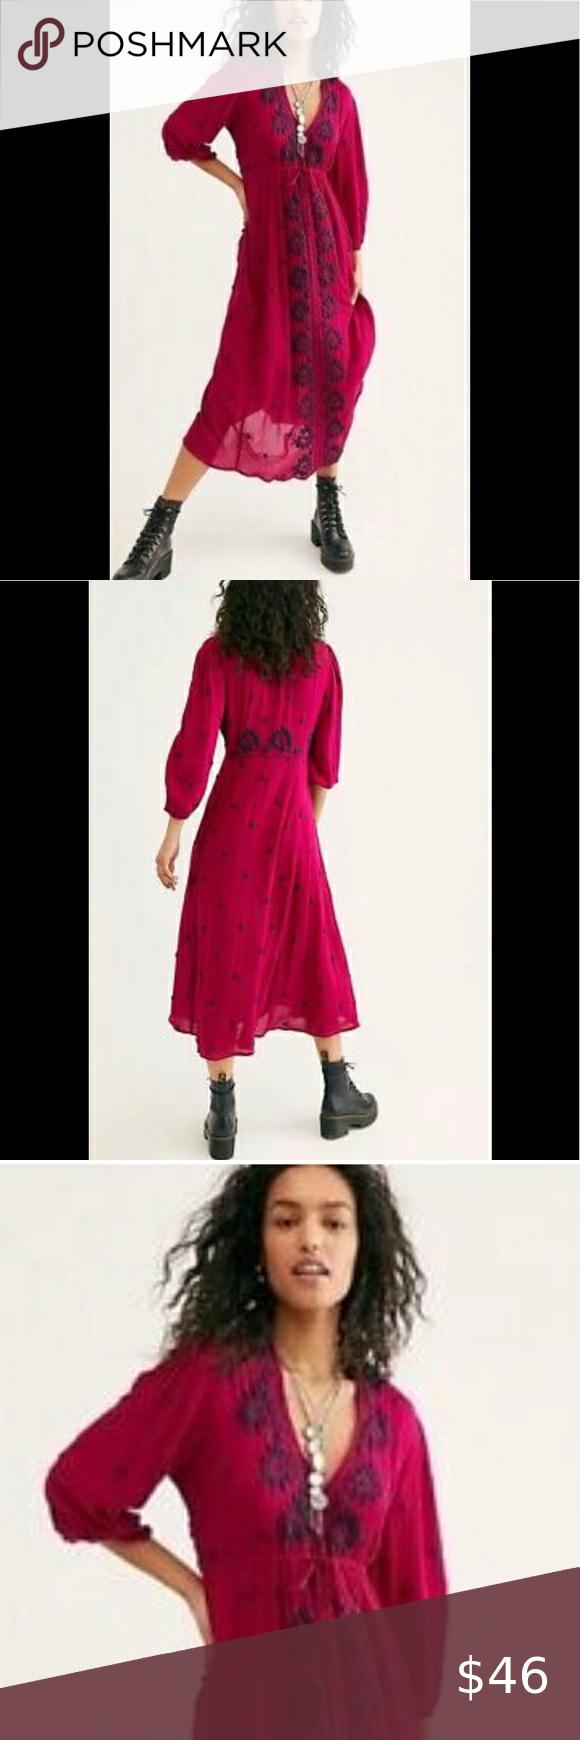 New Listing Free People Dress SZ-S BNWT